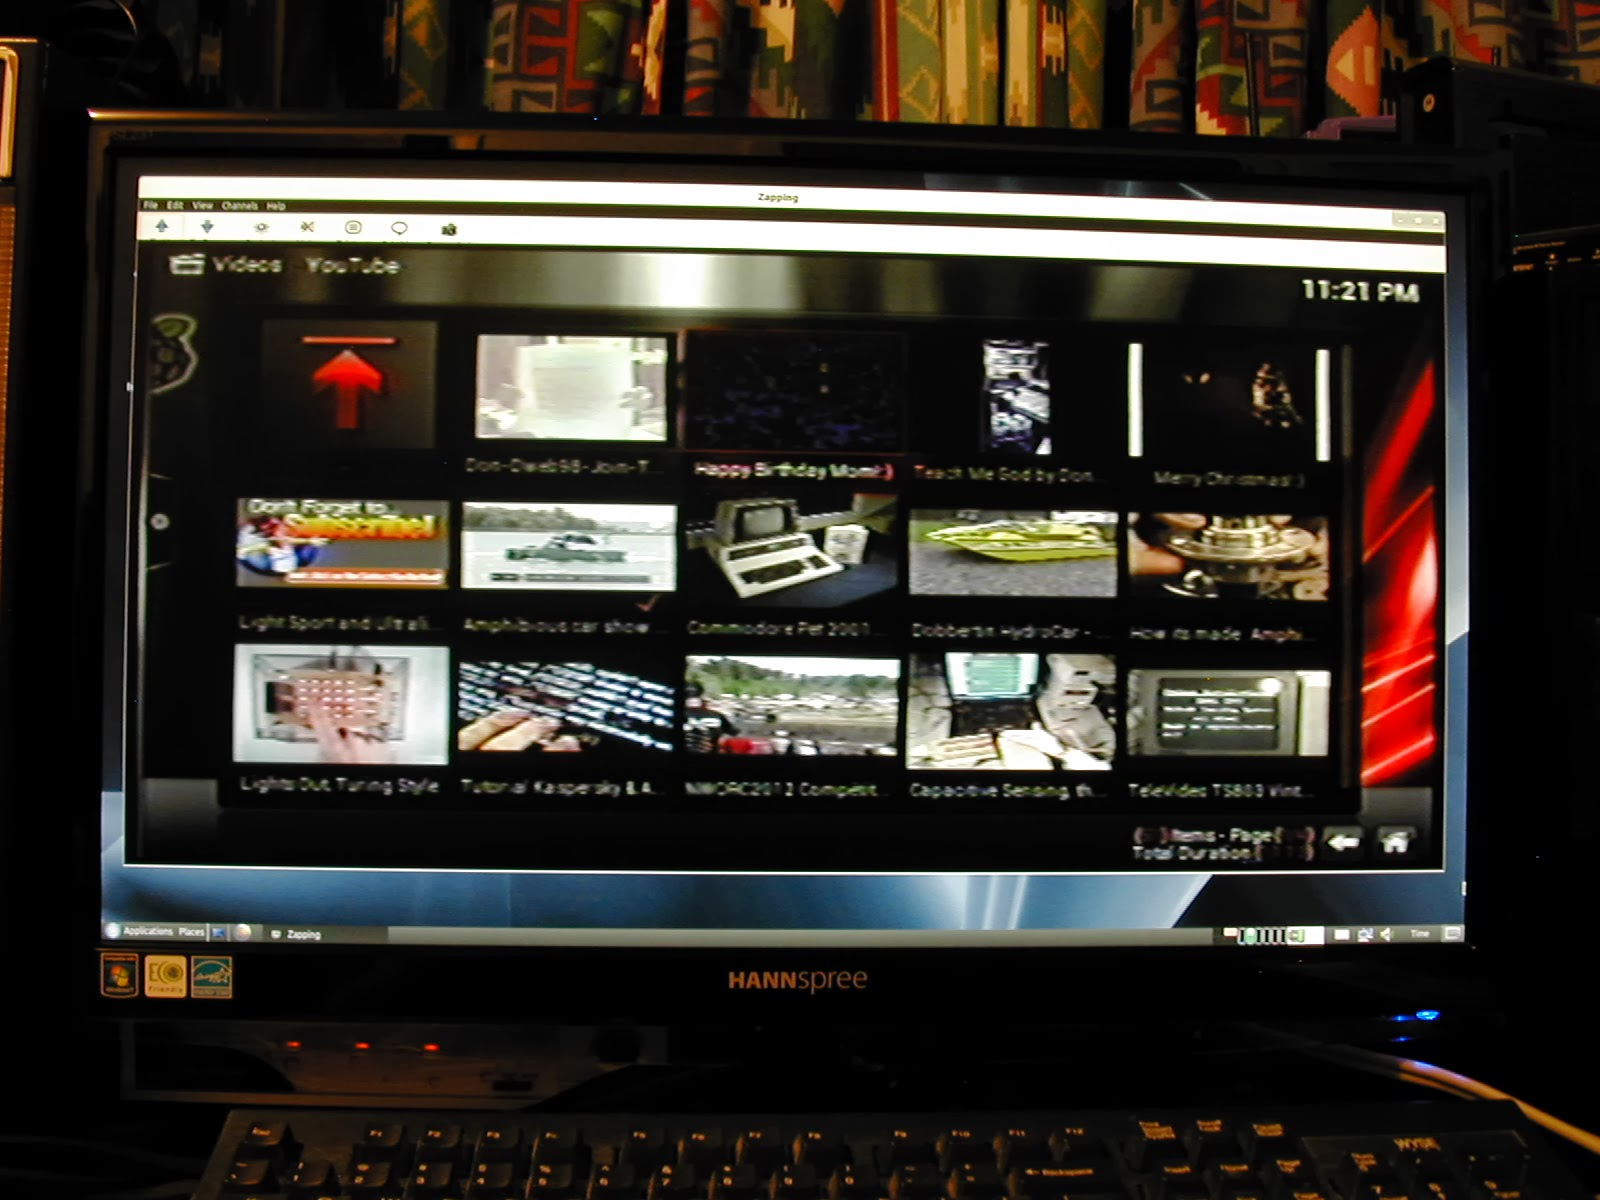 download raspberry pi xbmc image